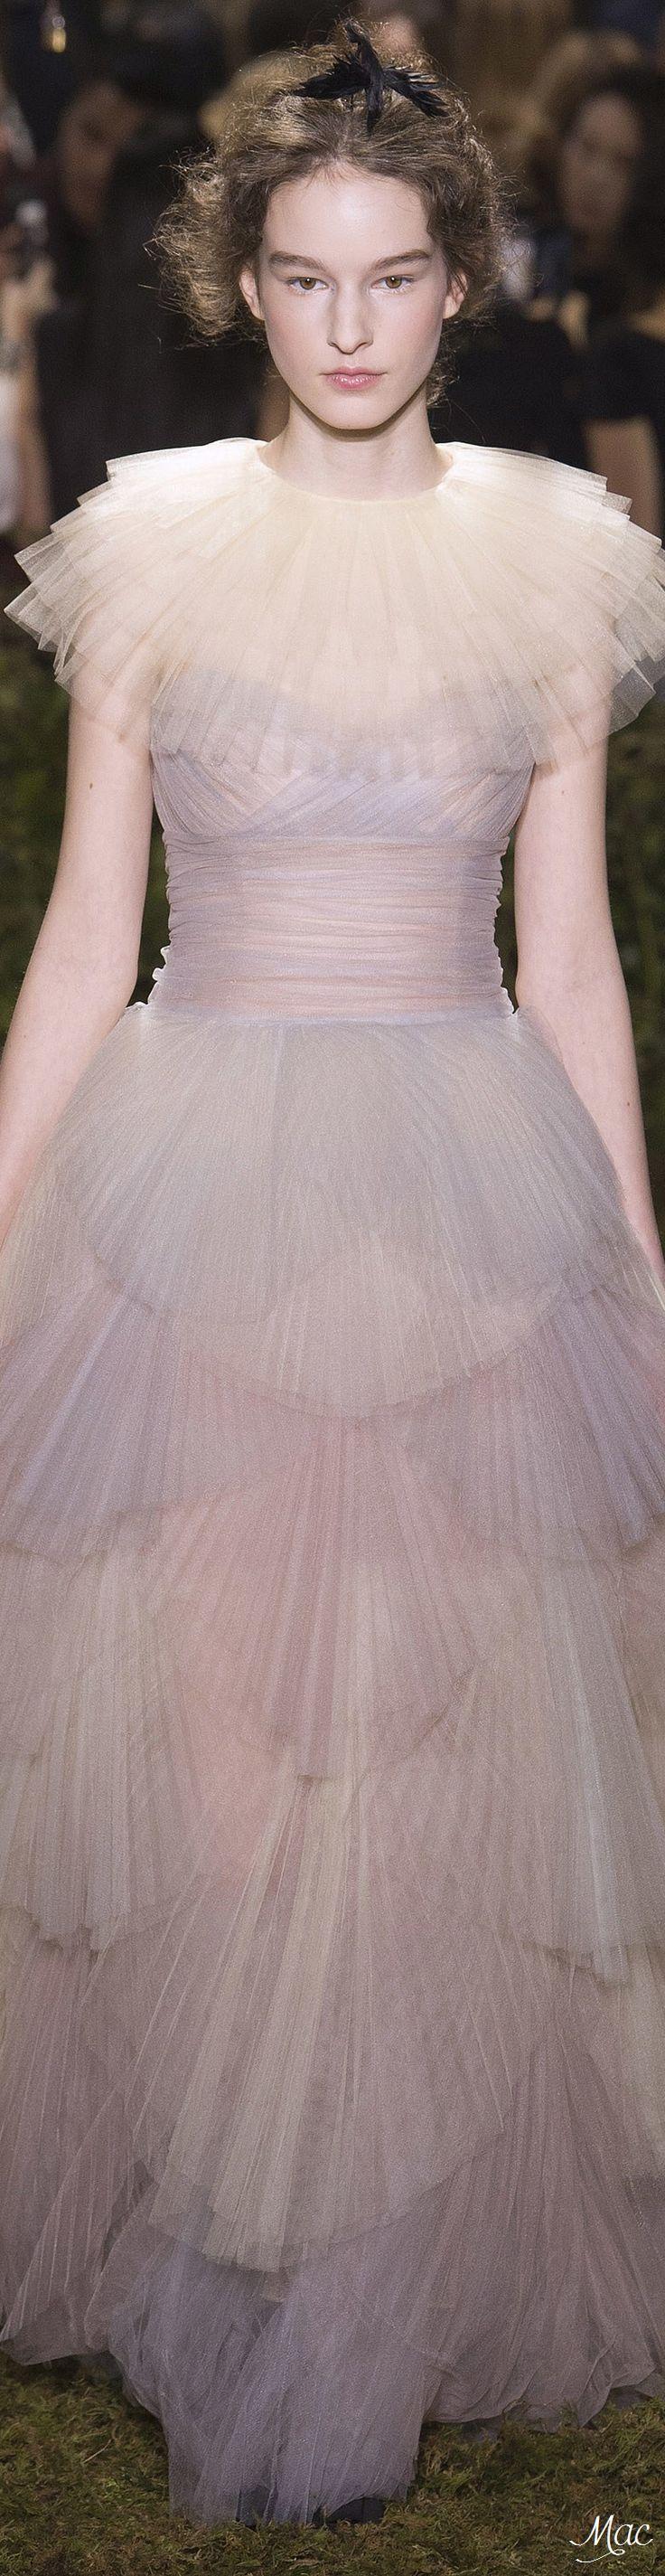 best style cream neutral images on pinterest bridal dresses